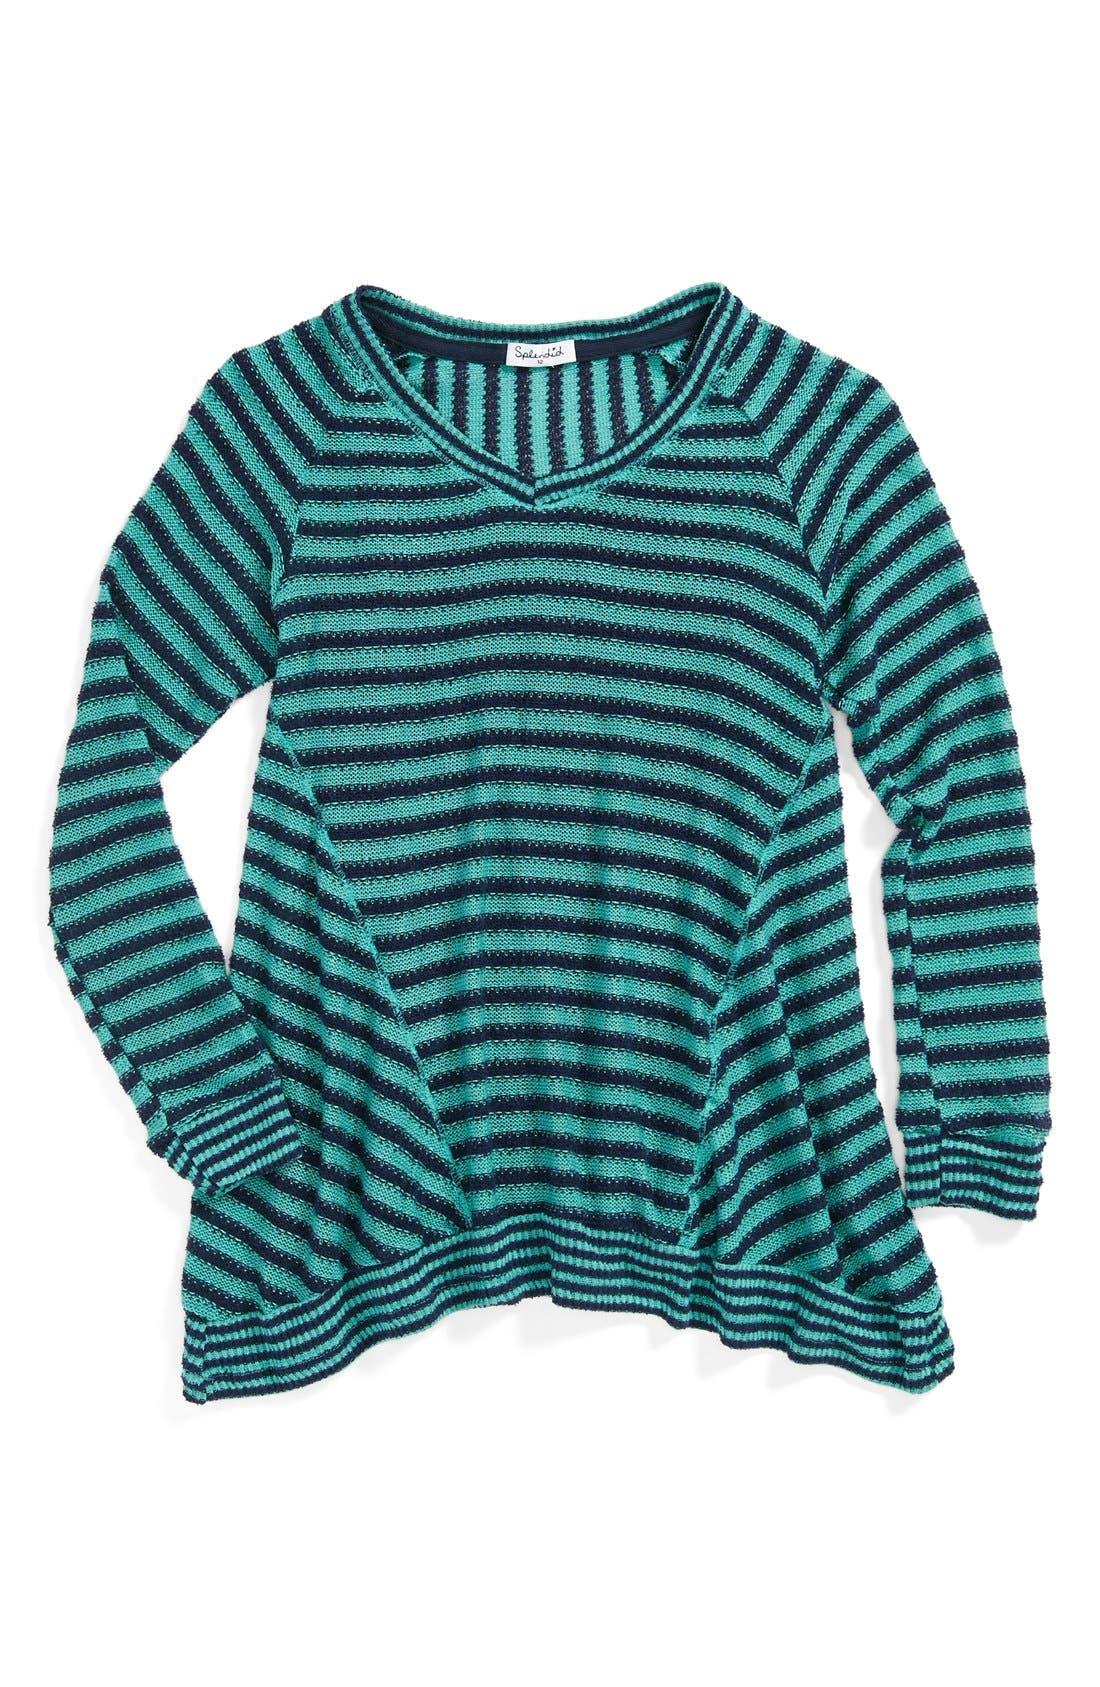 Alternate Image 1 Selected - Splendid Stripe Sweater (Big Girls)